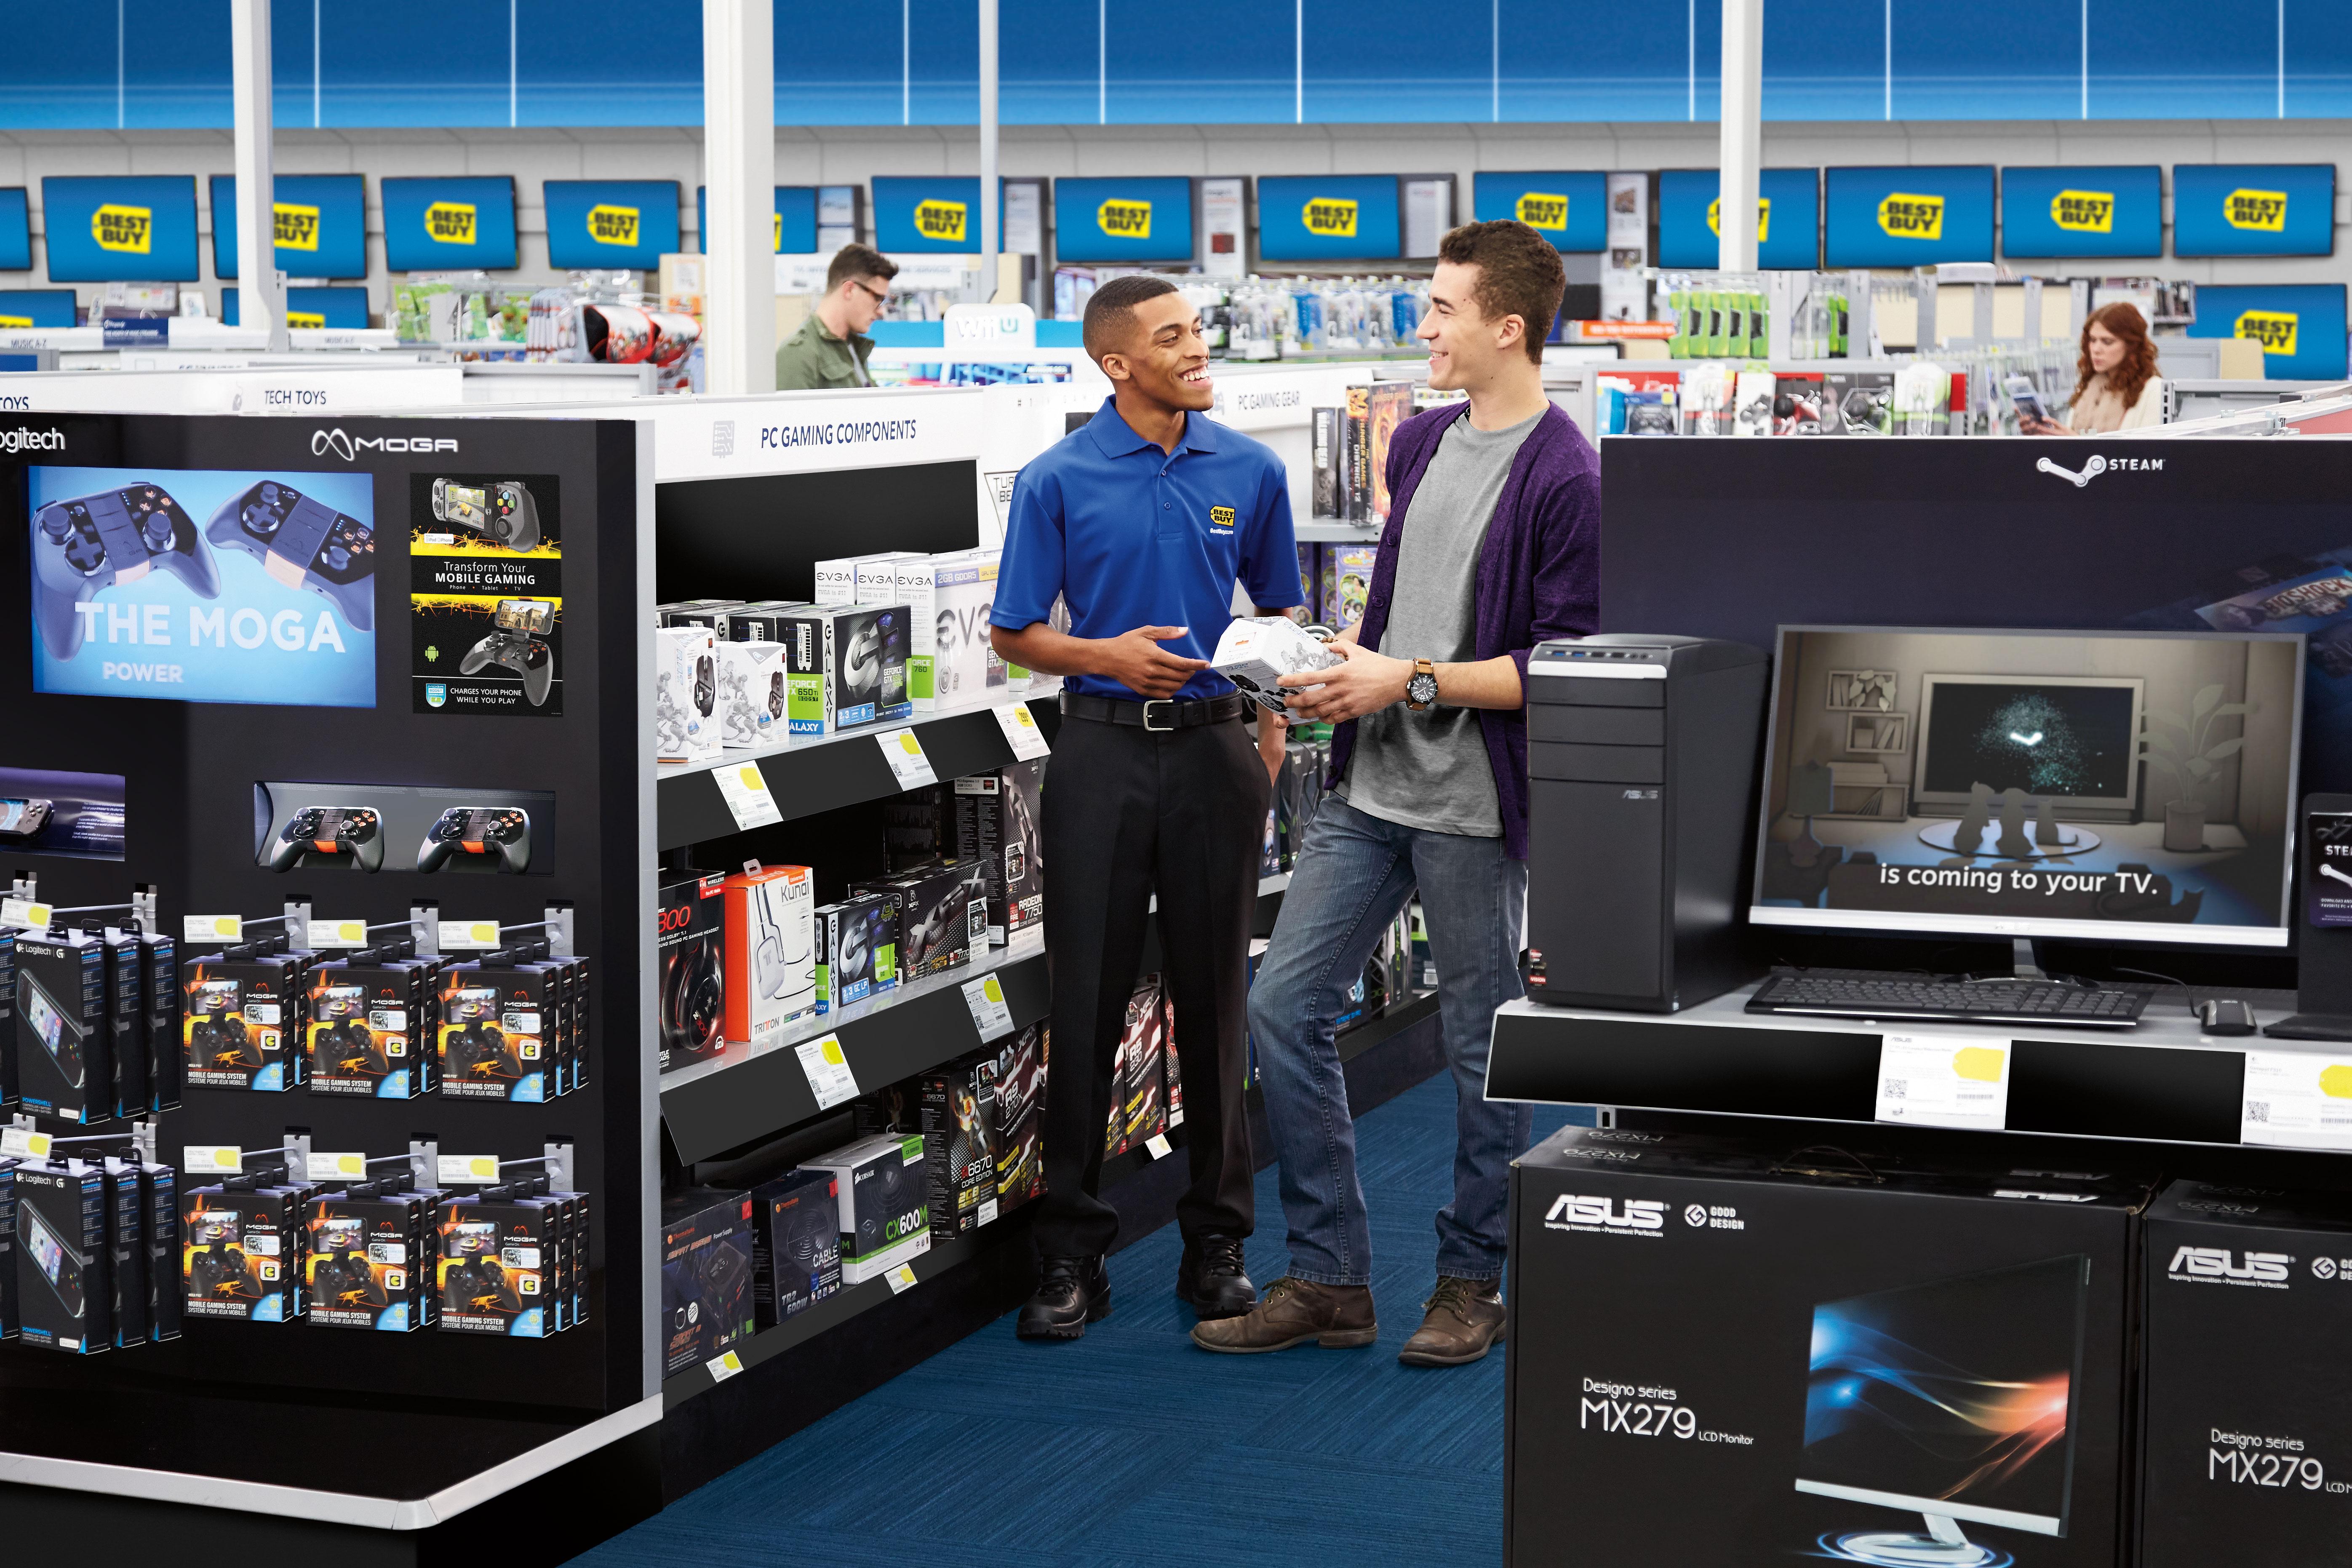 A Best Buy employee helping a customer.